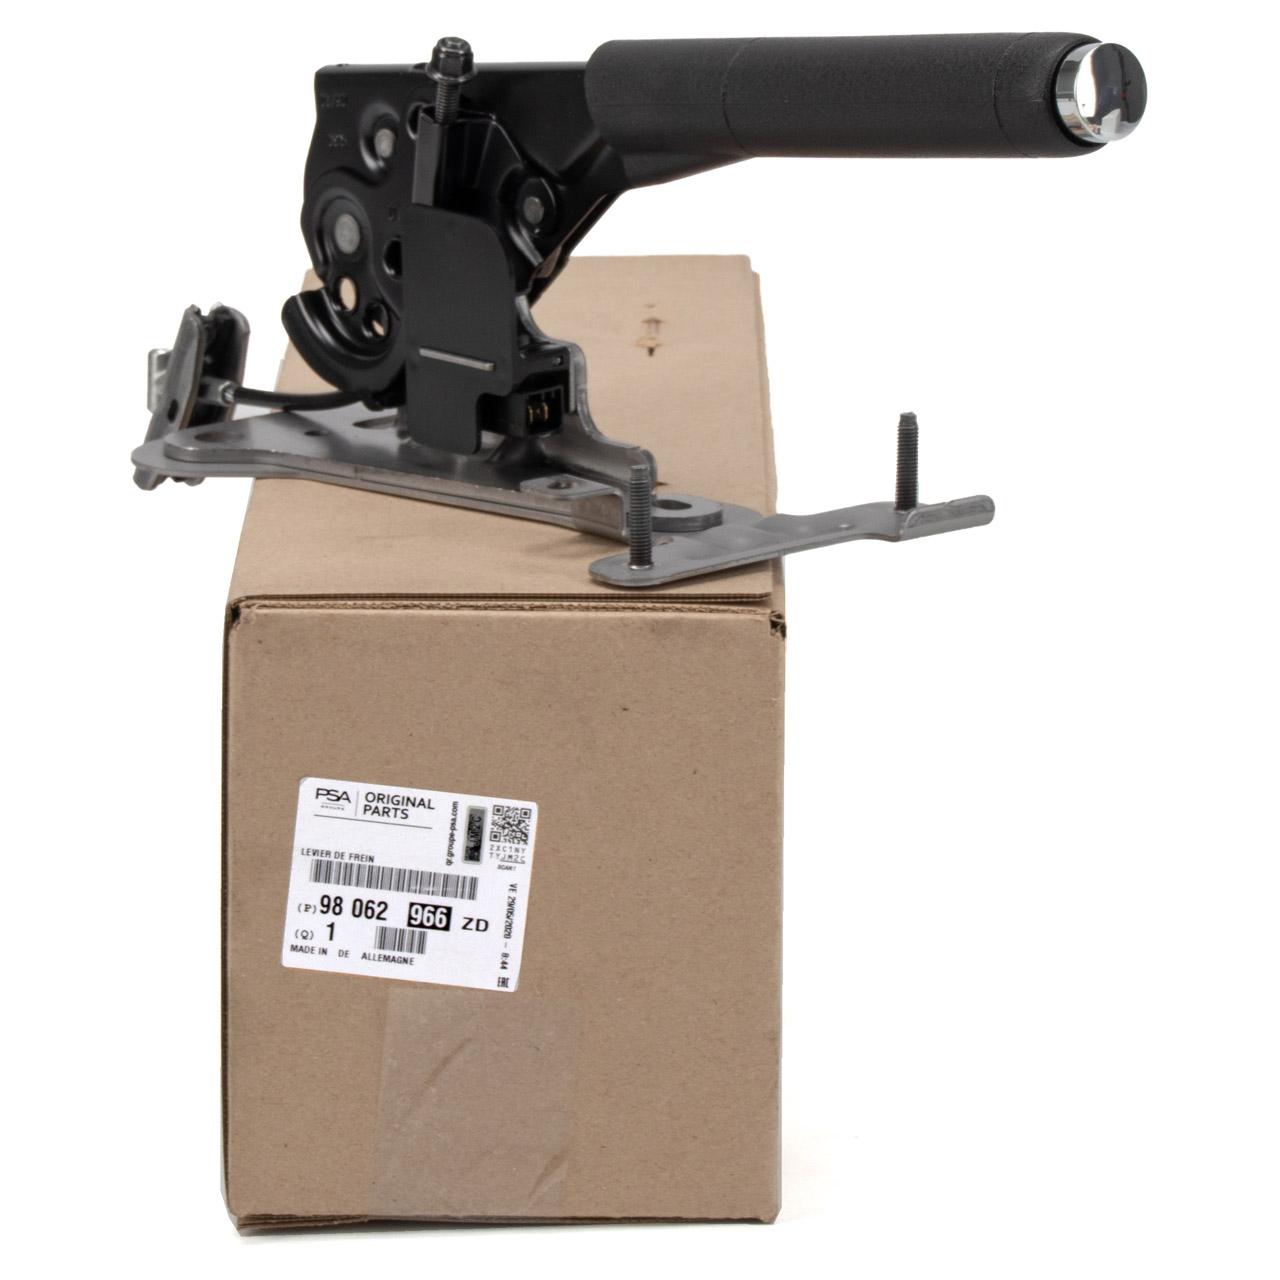 ORIGINAL PSA Handbremshebel Handbremsgriff DS3 207 CC / SW 98062966ZD